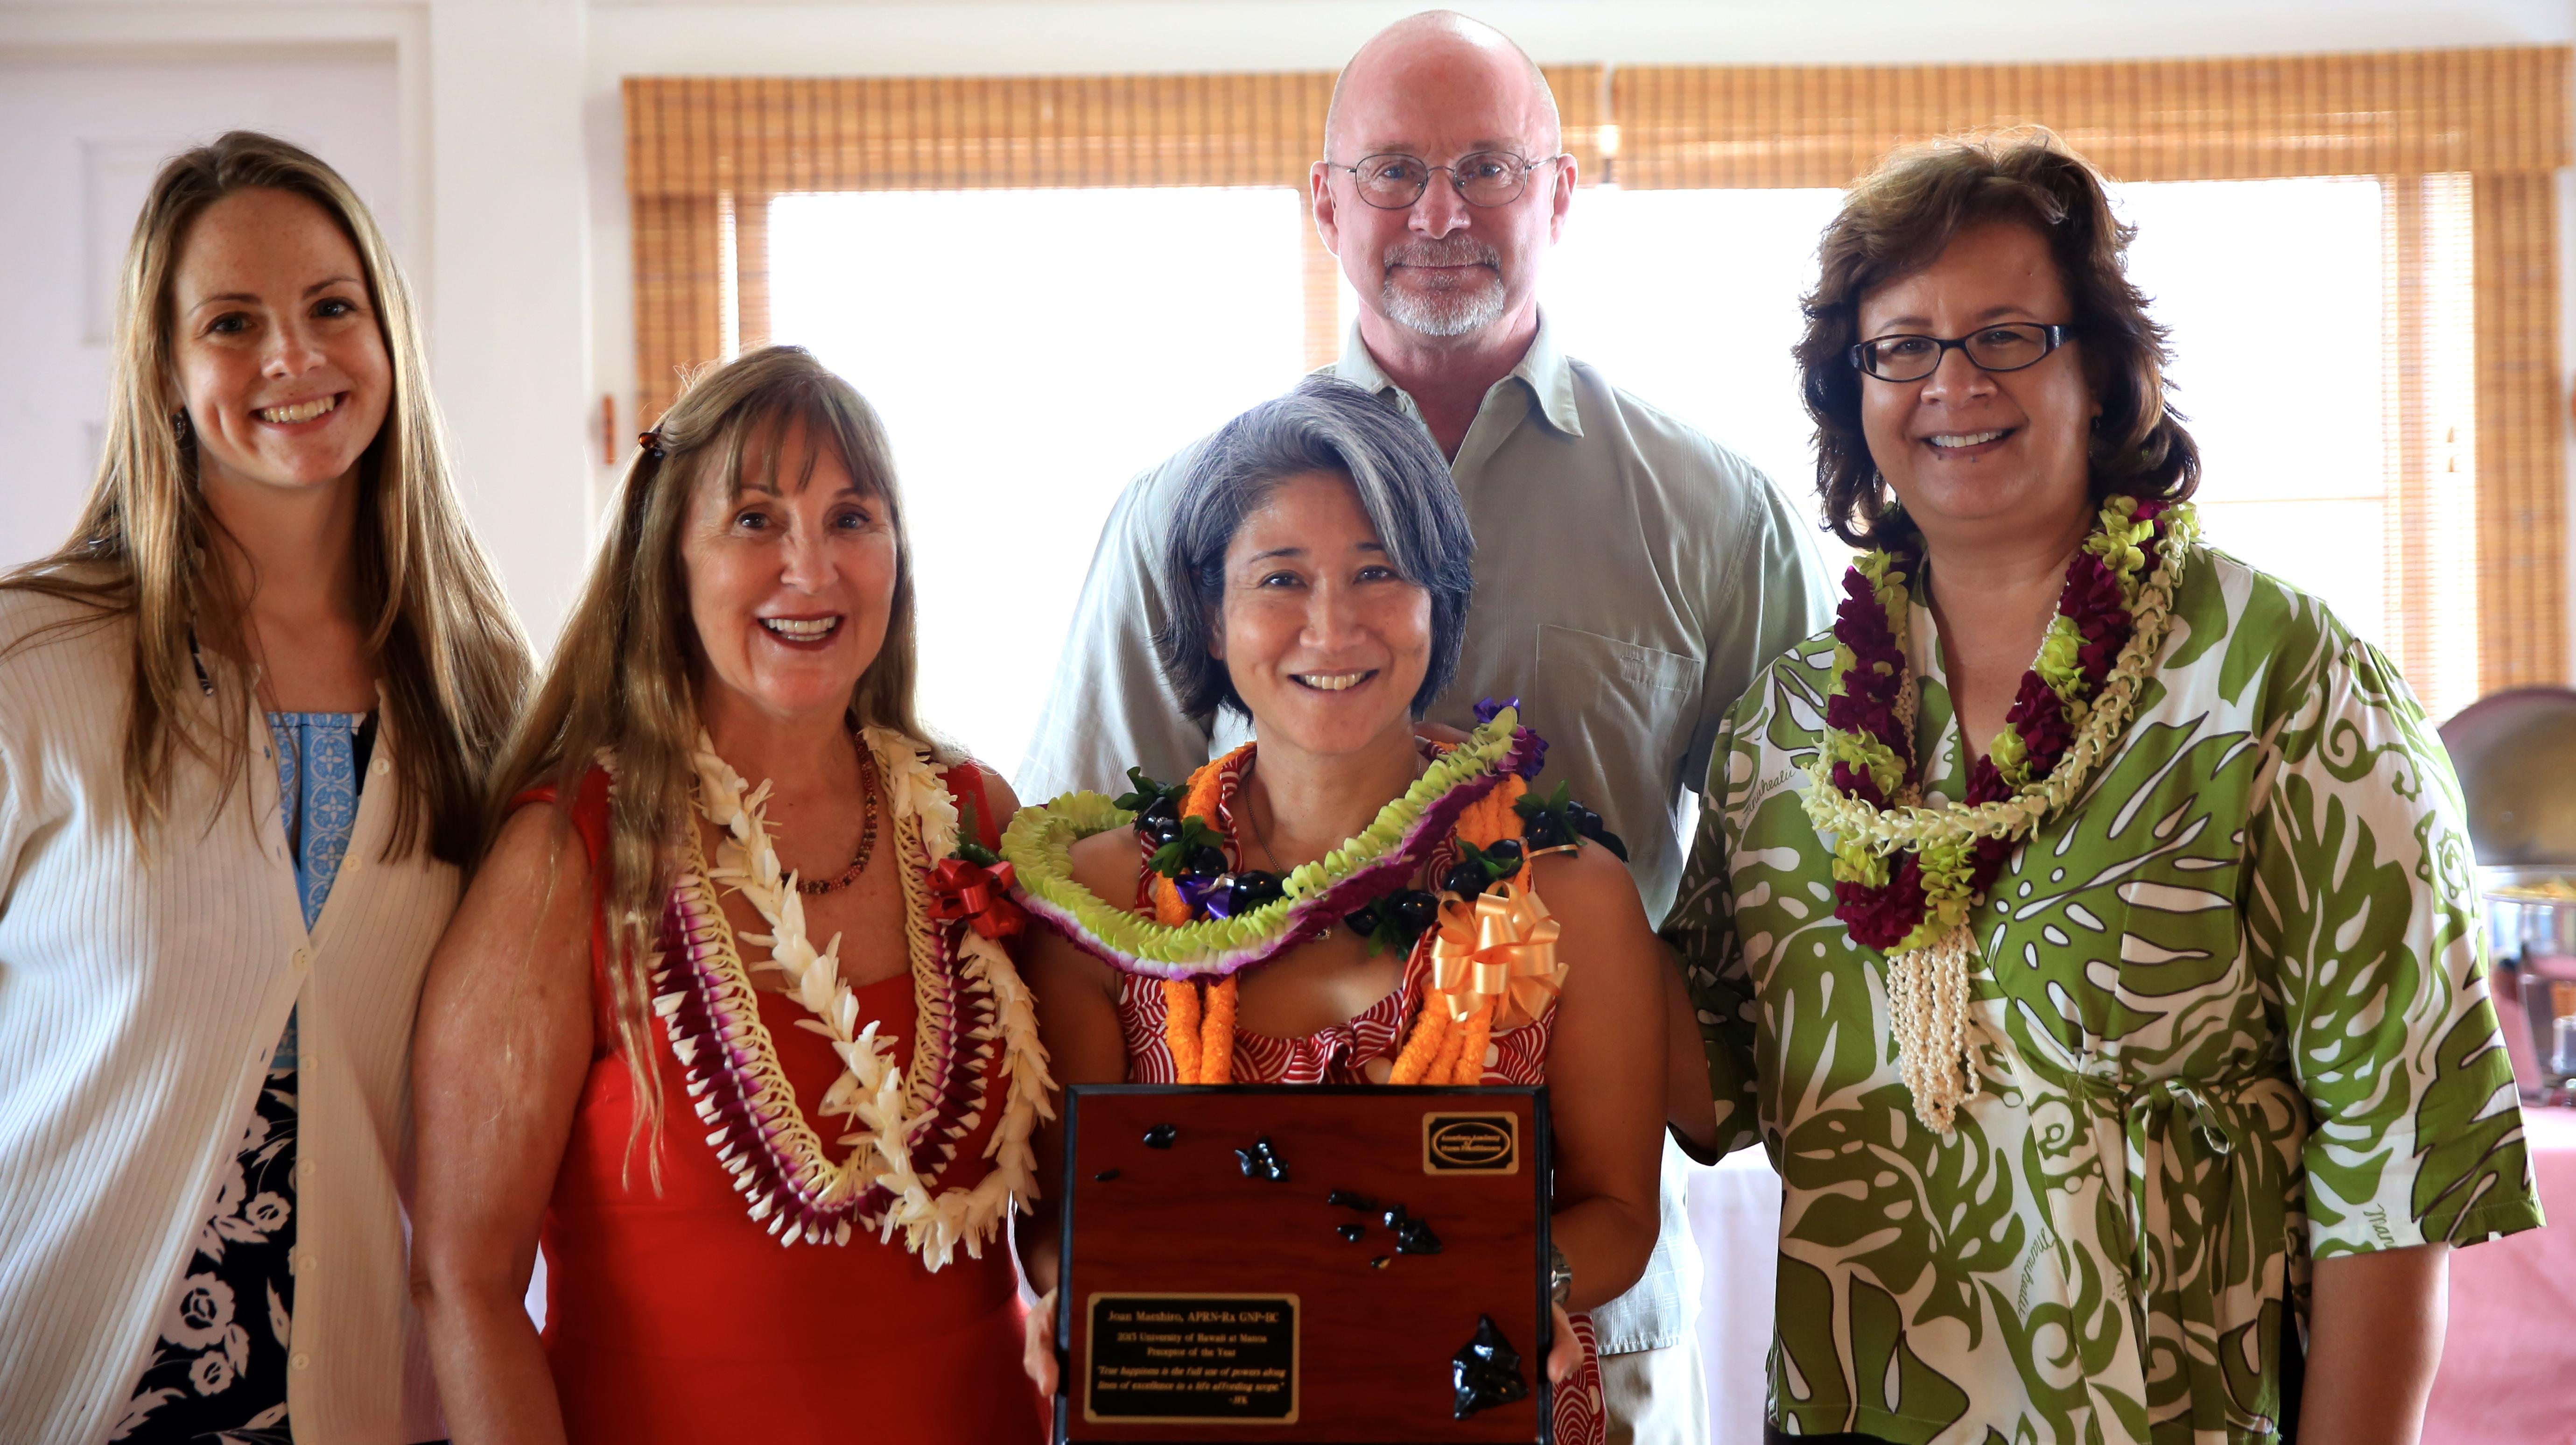 Joan Maeshiro smiles for photo